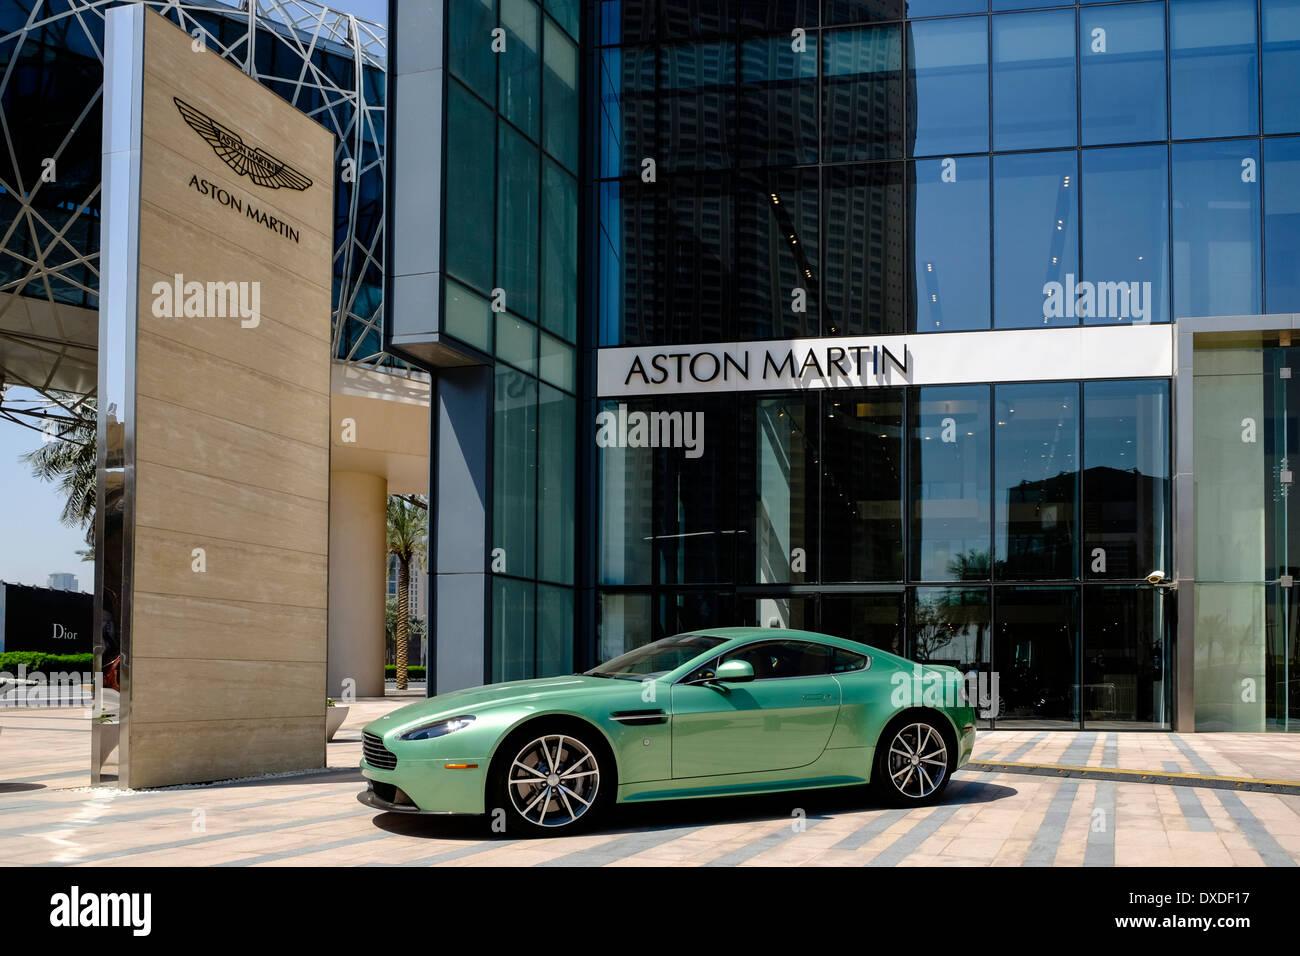 Showroom Of Aston Martin Luxury Cars In Dubai United Arab Emirates